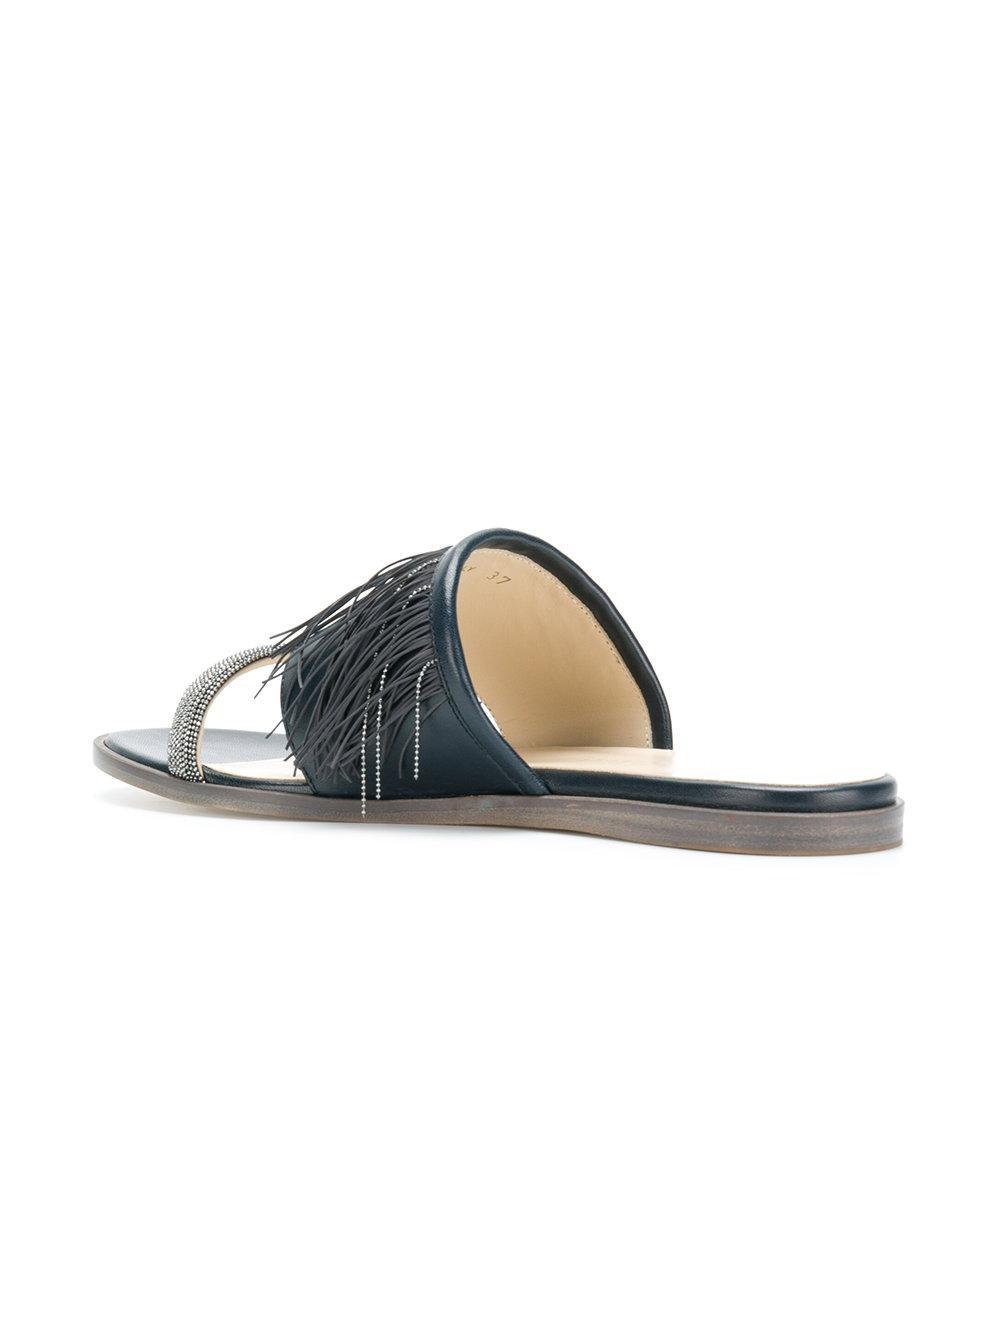 fringed sandals - Blue Fabiana Filippi J49fr